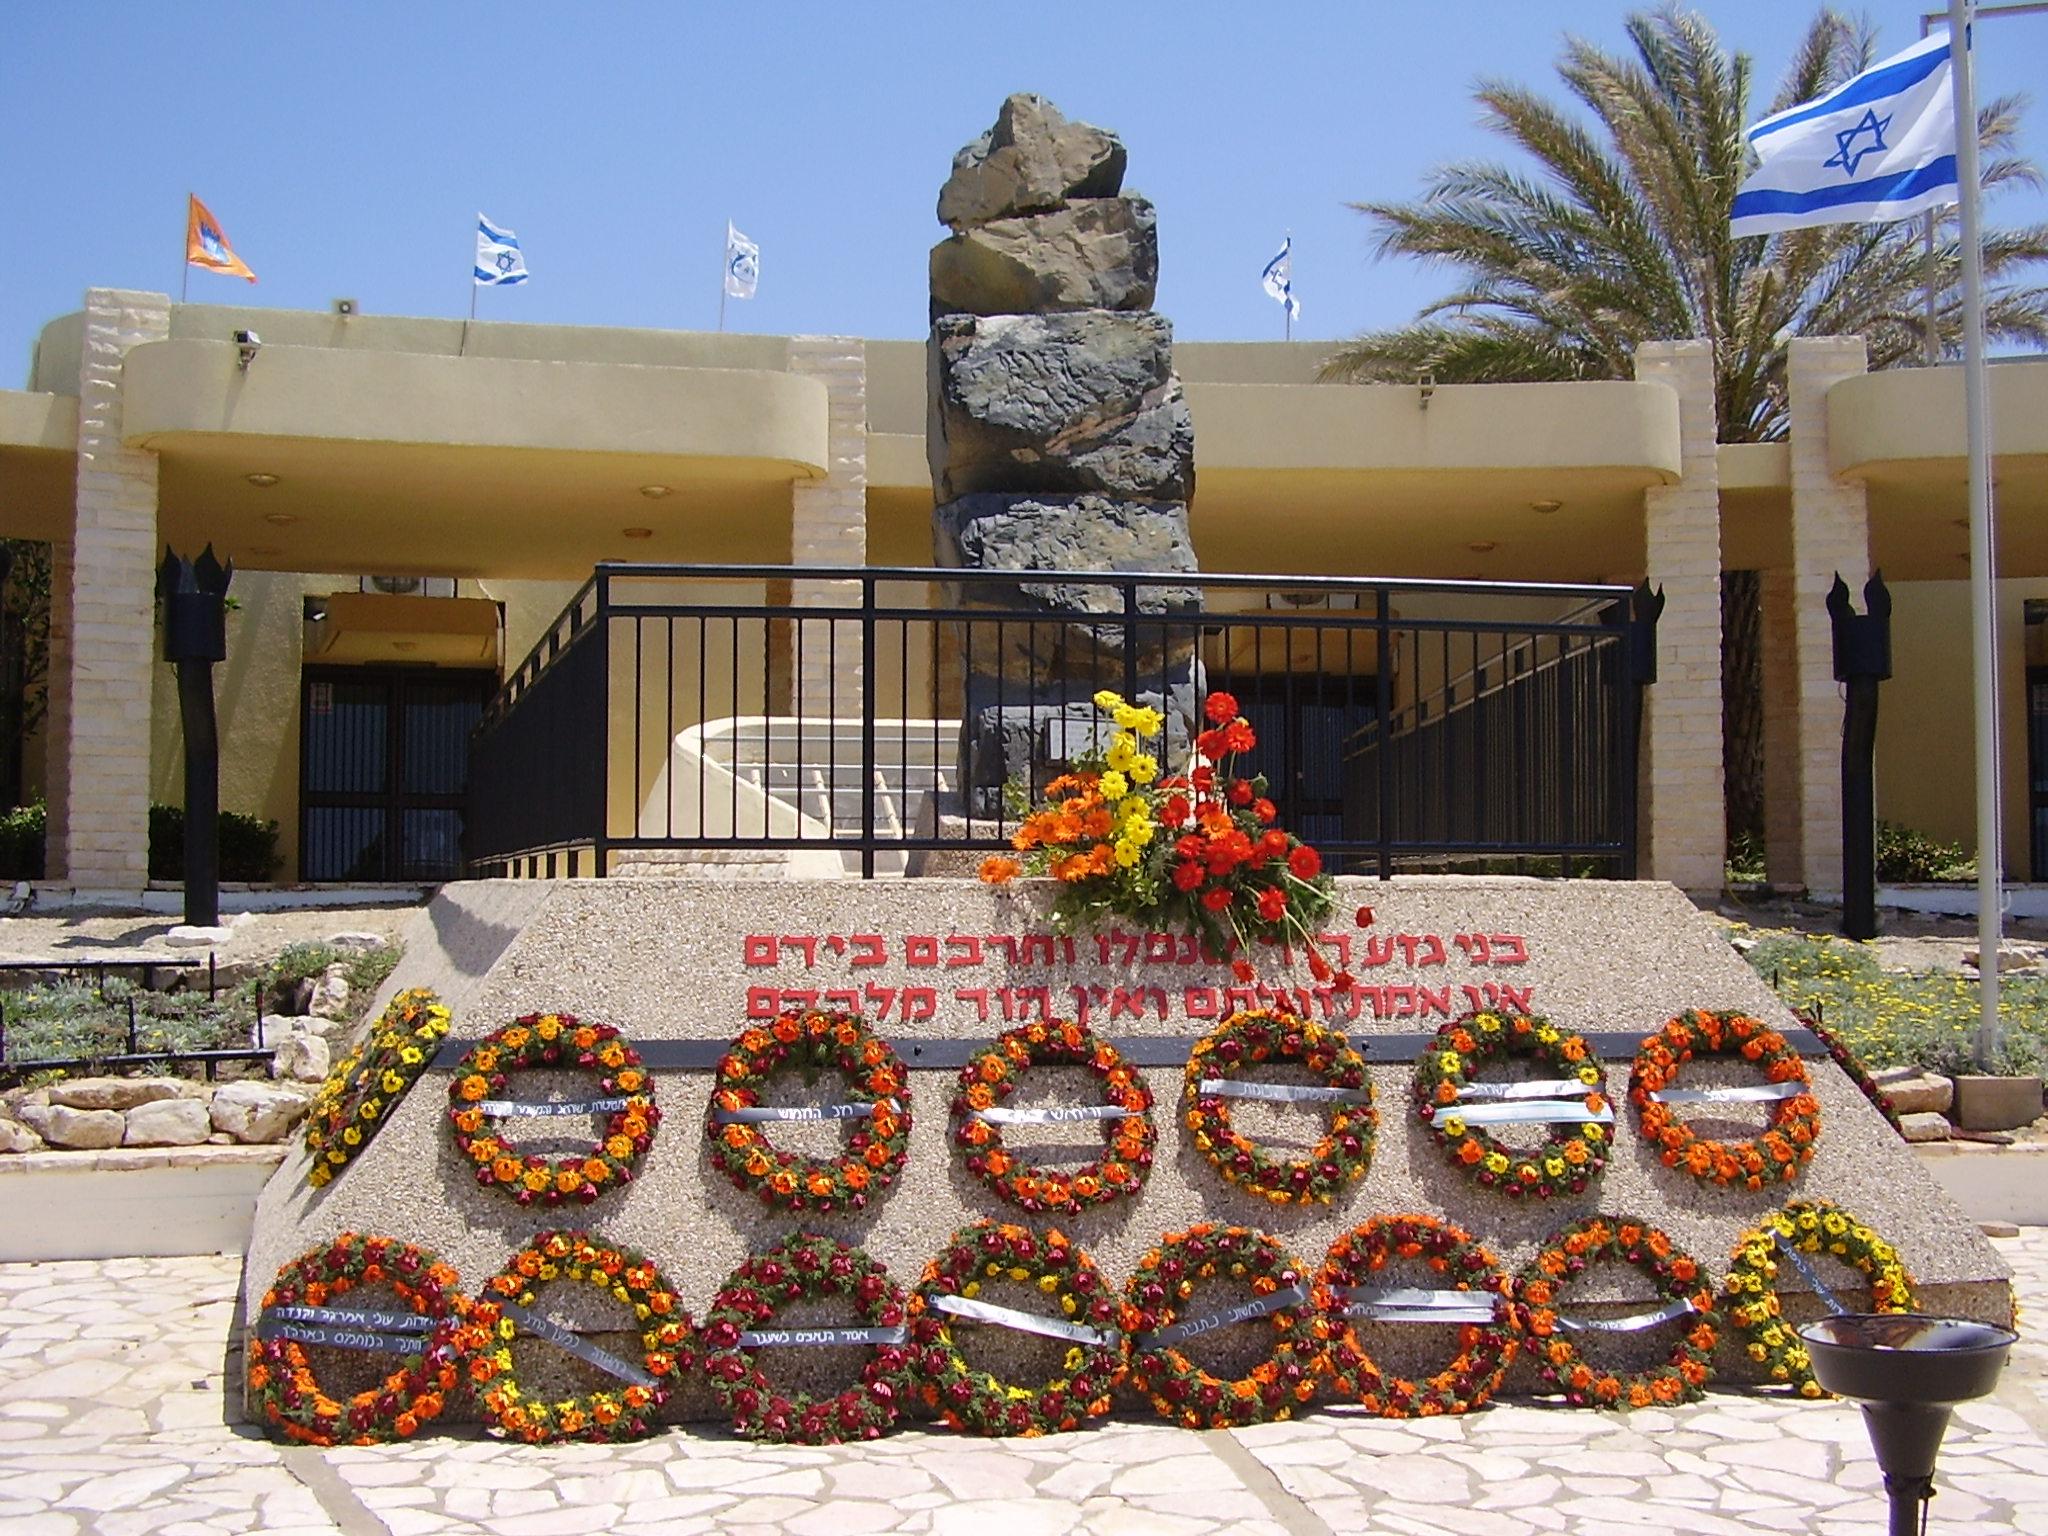 File:Yad labanim memorial in netanya.jpg - Wikimedia Commons